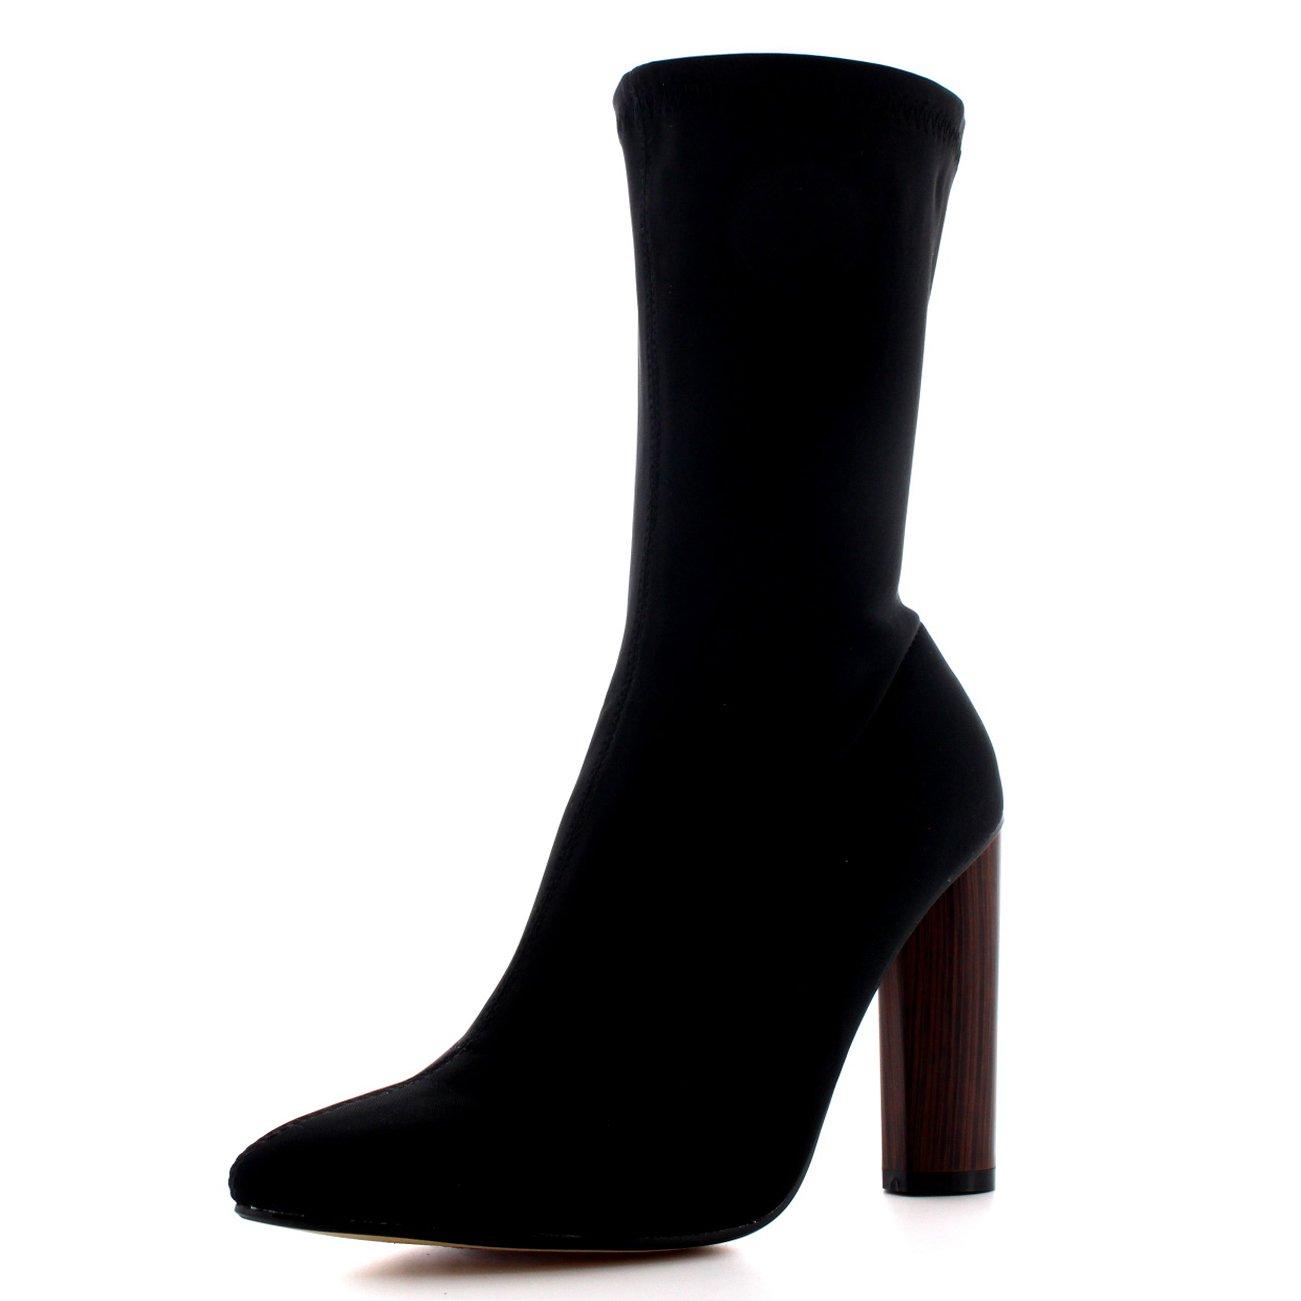 TALLA 39 EU. Mujer Talón Apilado Dedo Puntiagudo Moda Negro Elegante Vestir Botines